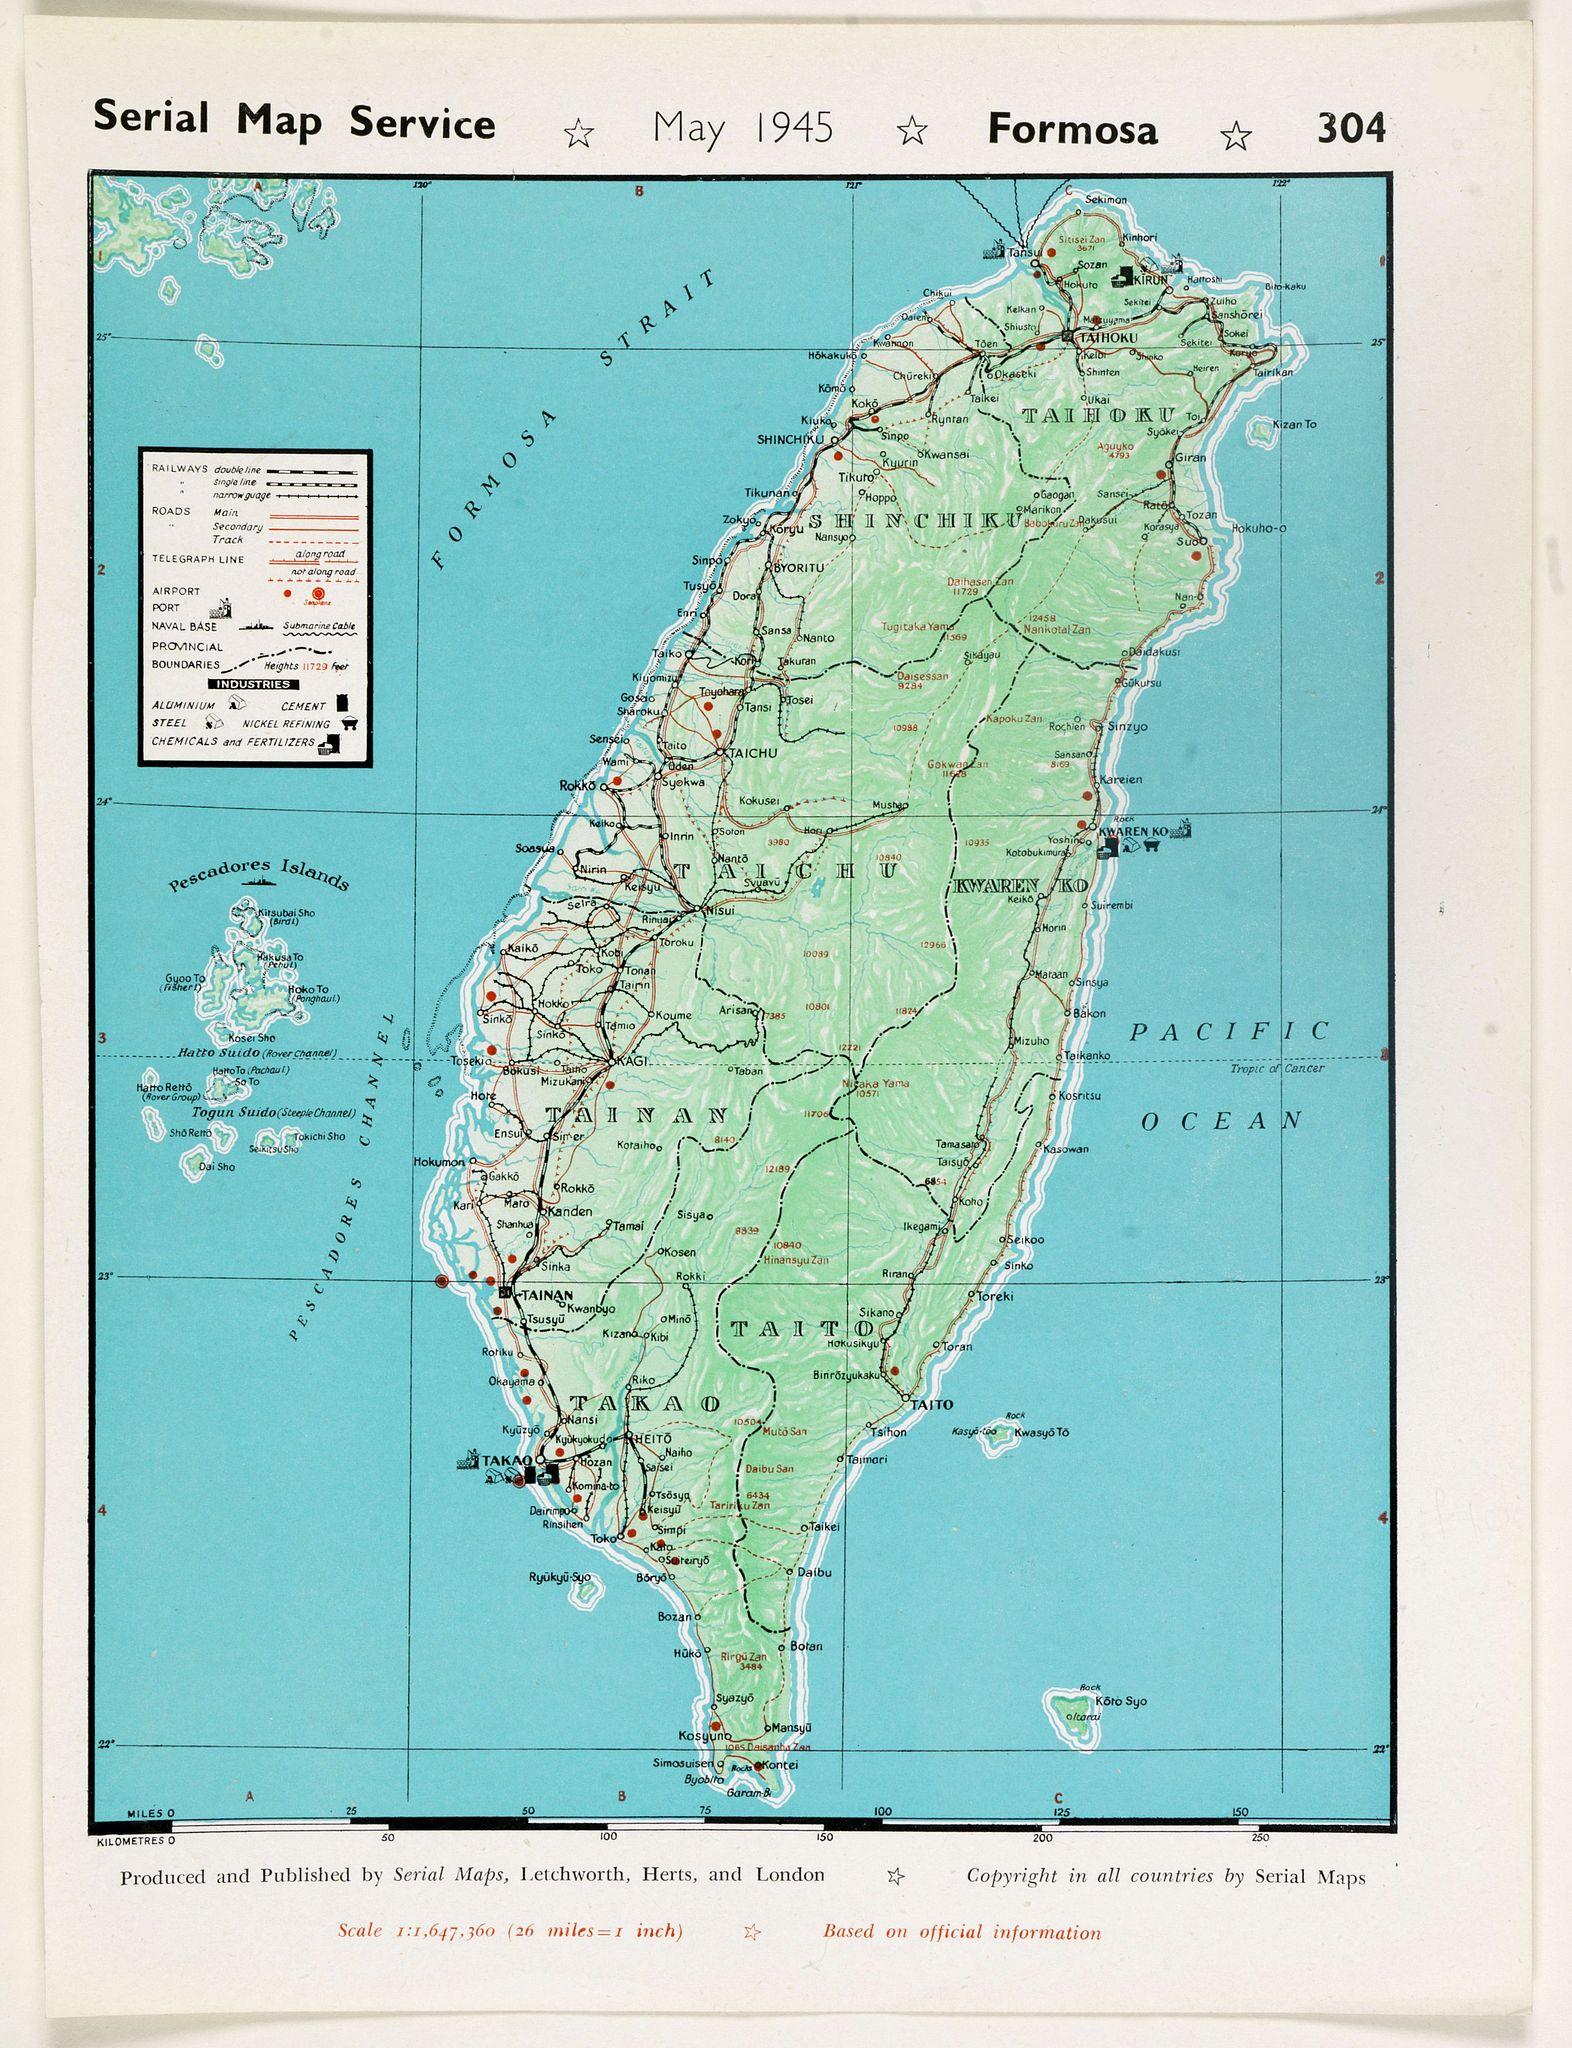 SERIAL MAP SERVICE -  Formosa. (304)